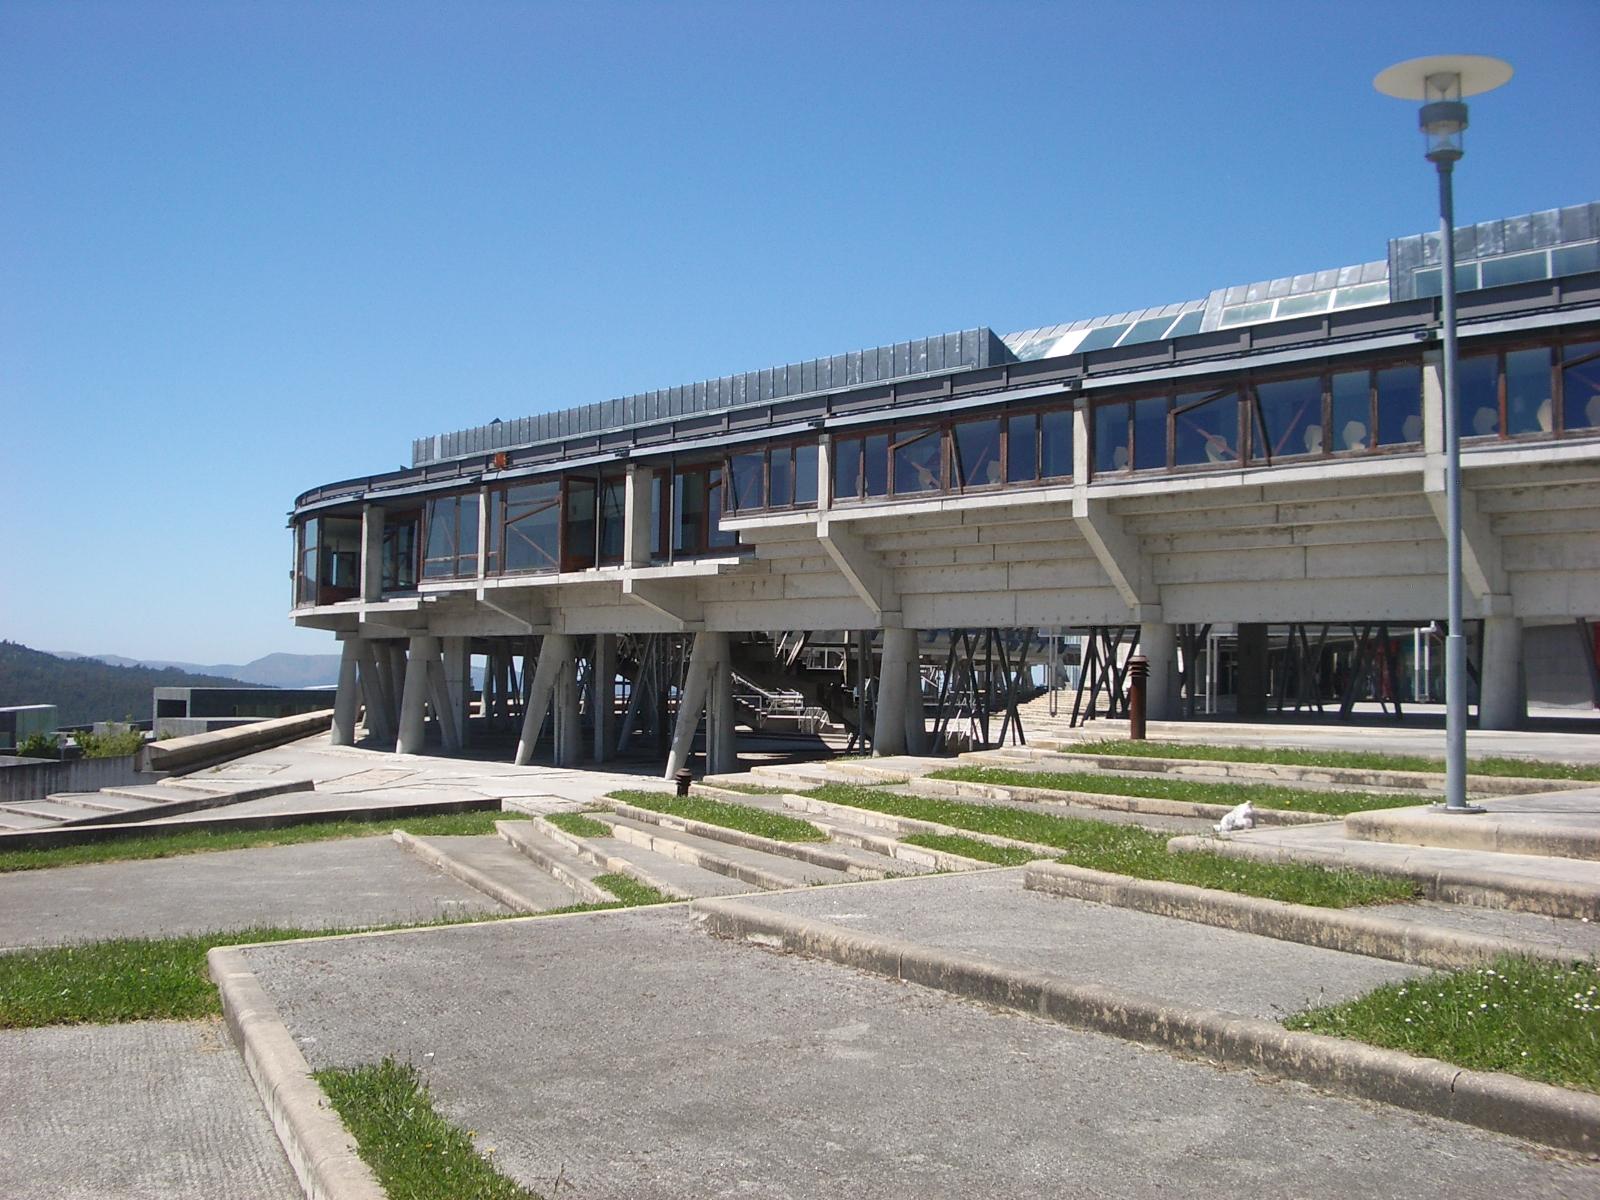 Patrimonio arquitect nico de asturias aulario o edificio miralles de la universidad de vigo - Arquitectos vigo ...